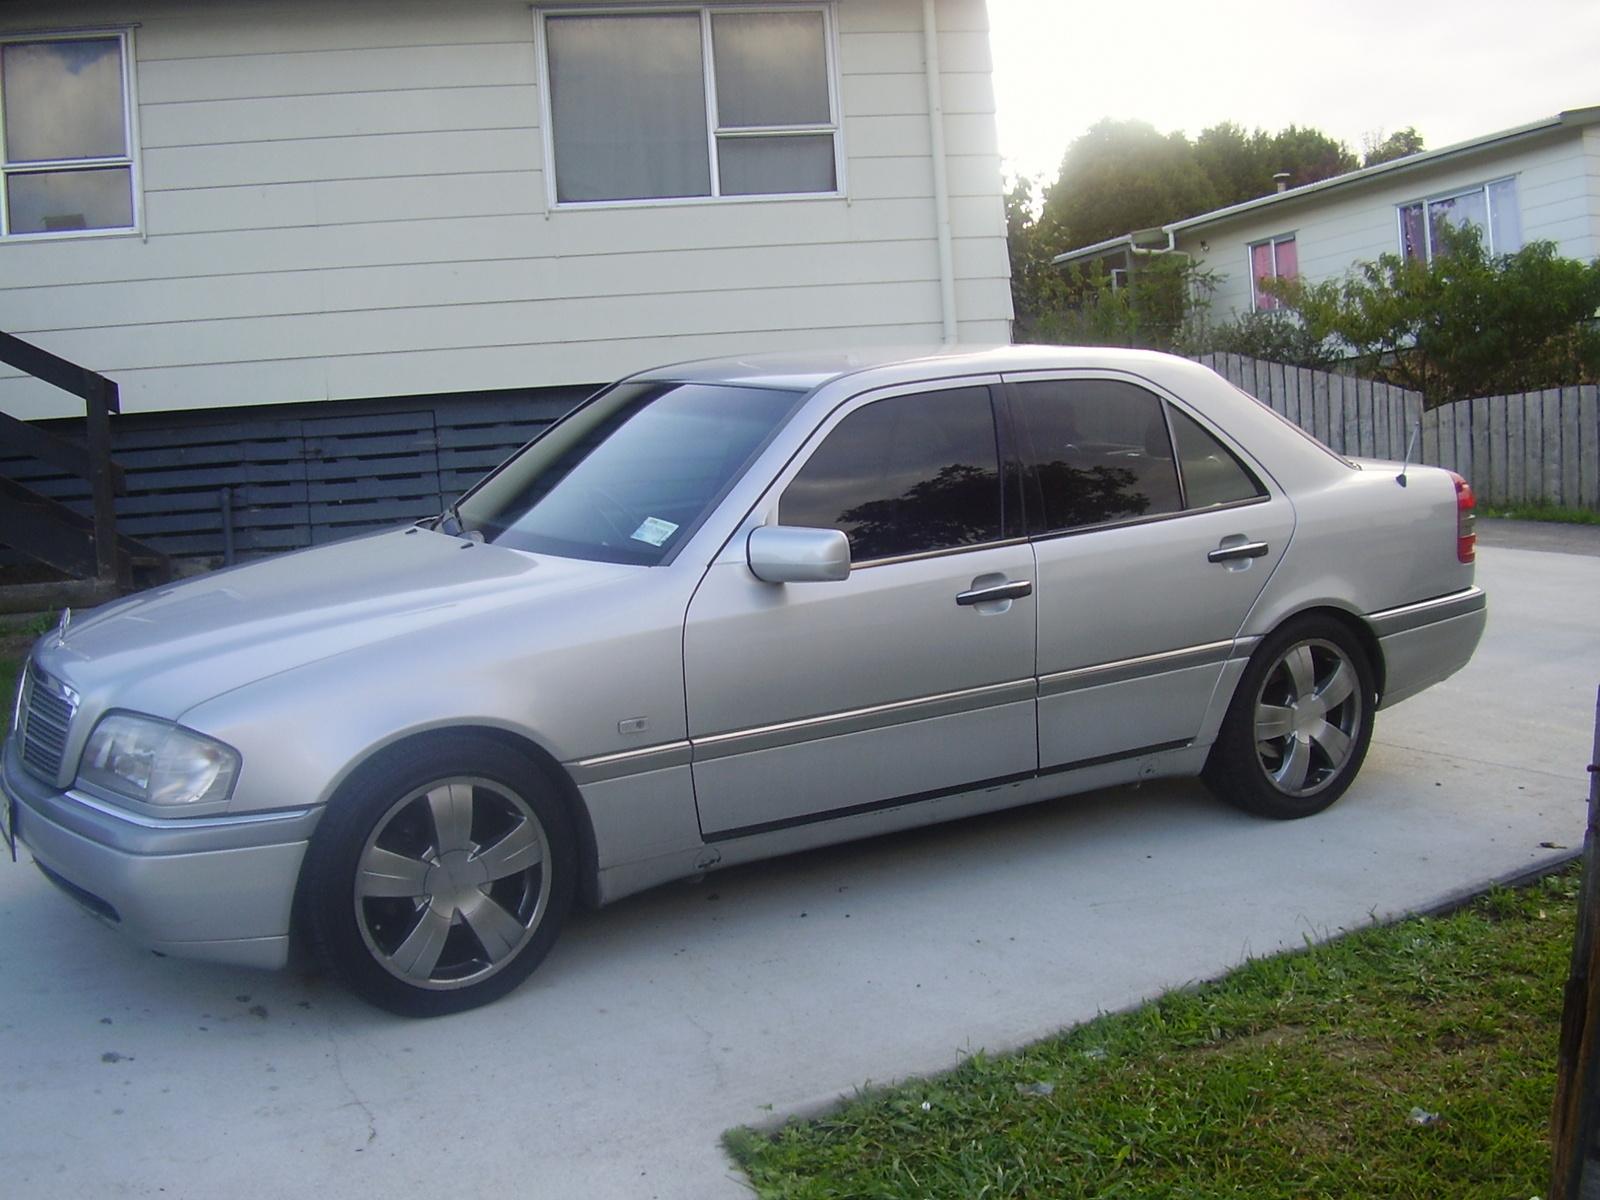 1996 mercedes benz c class image 13